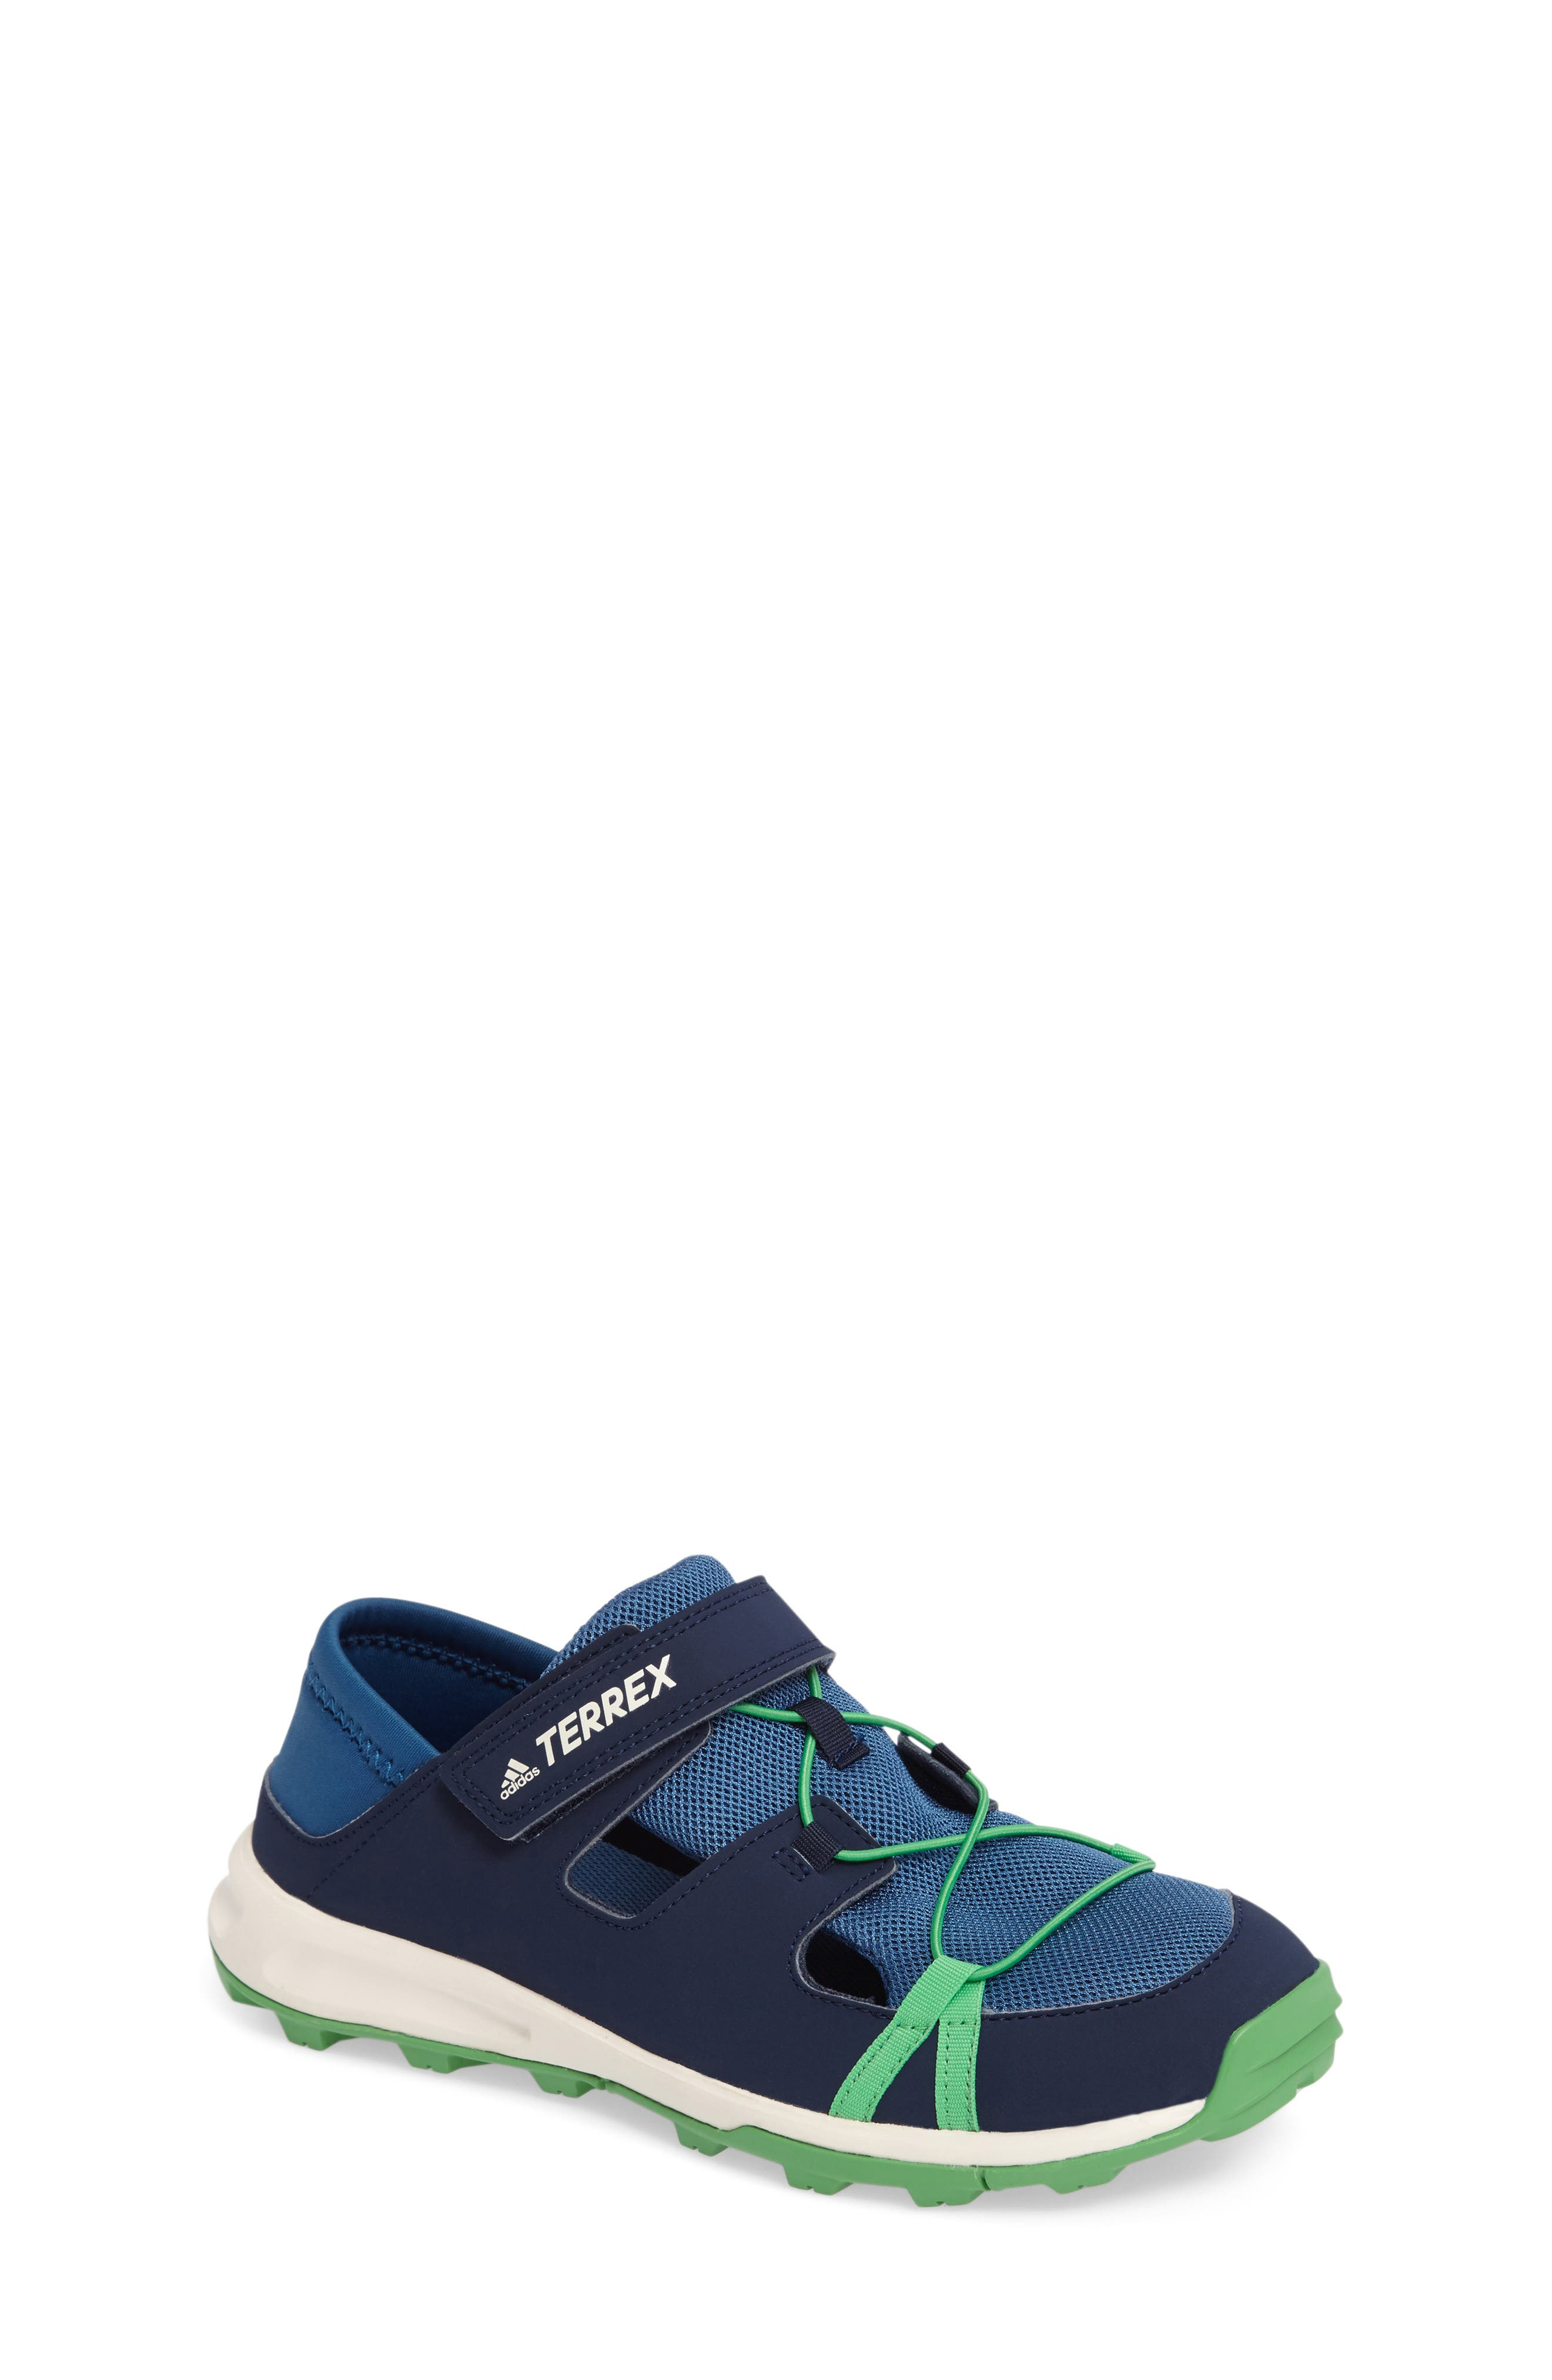 Terrex Tivid Sneaker,                             Main thumbnail 1, color,                             420